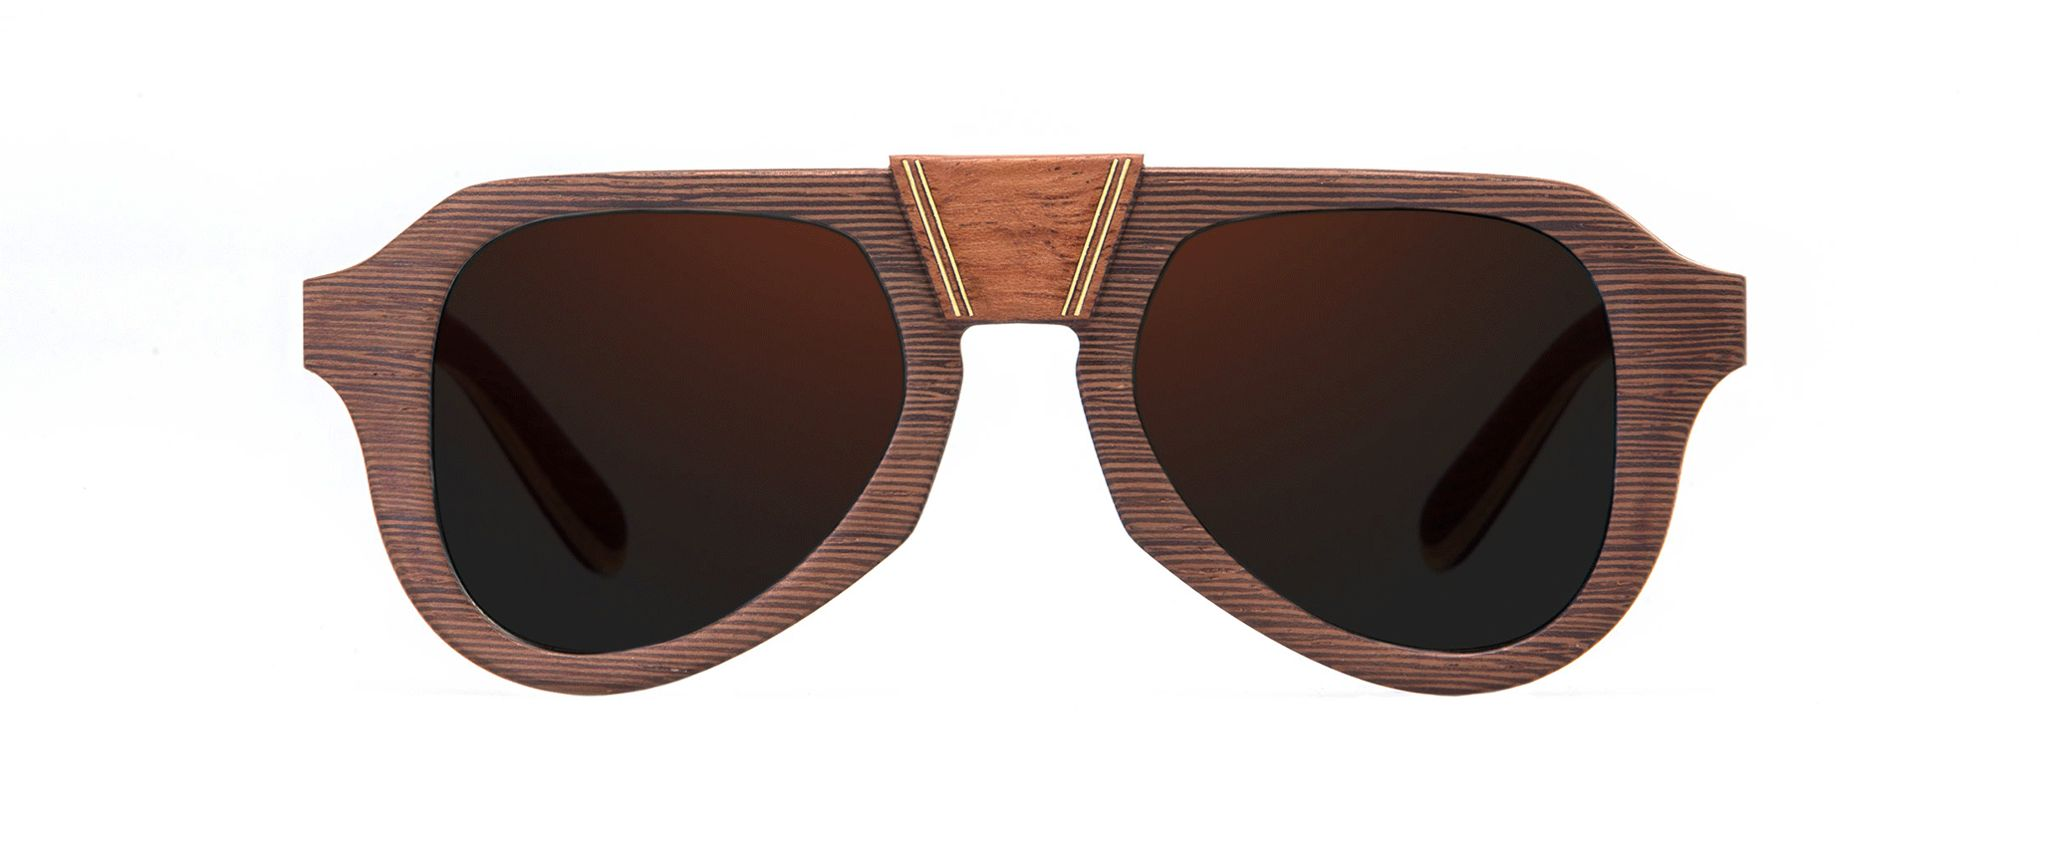 Aganjù Bubenga Vakay sunglasses